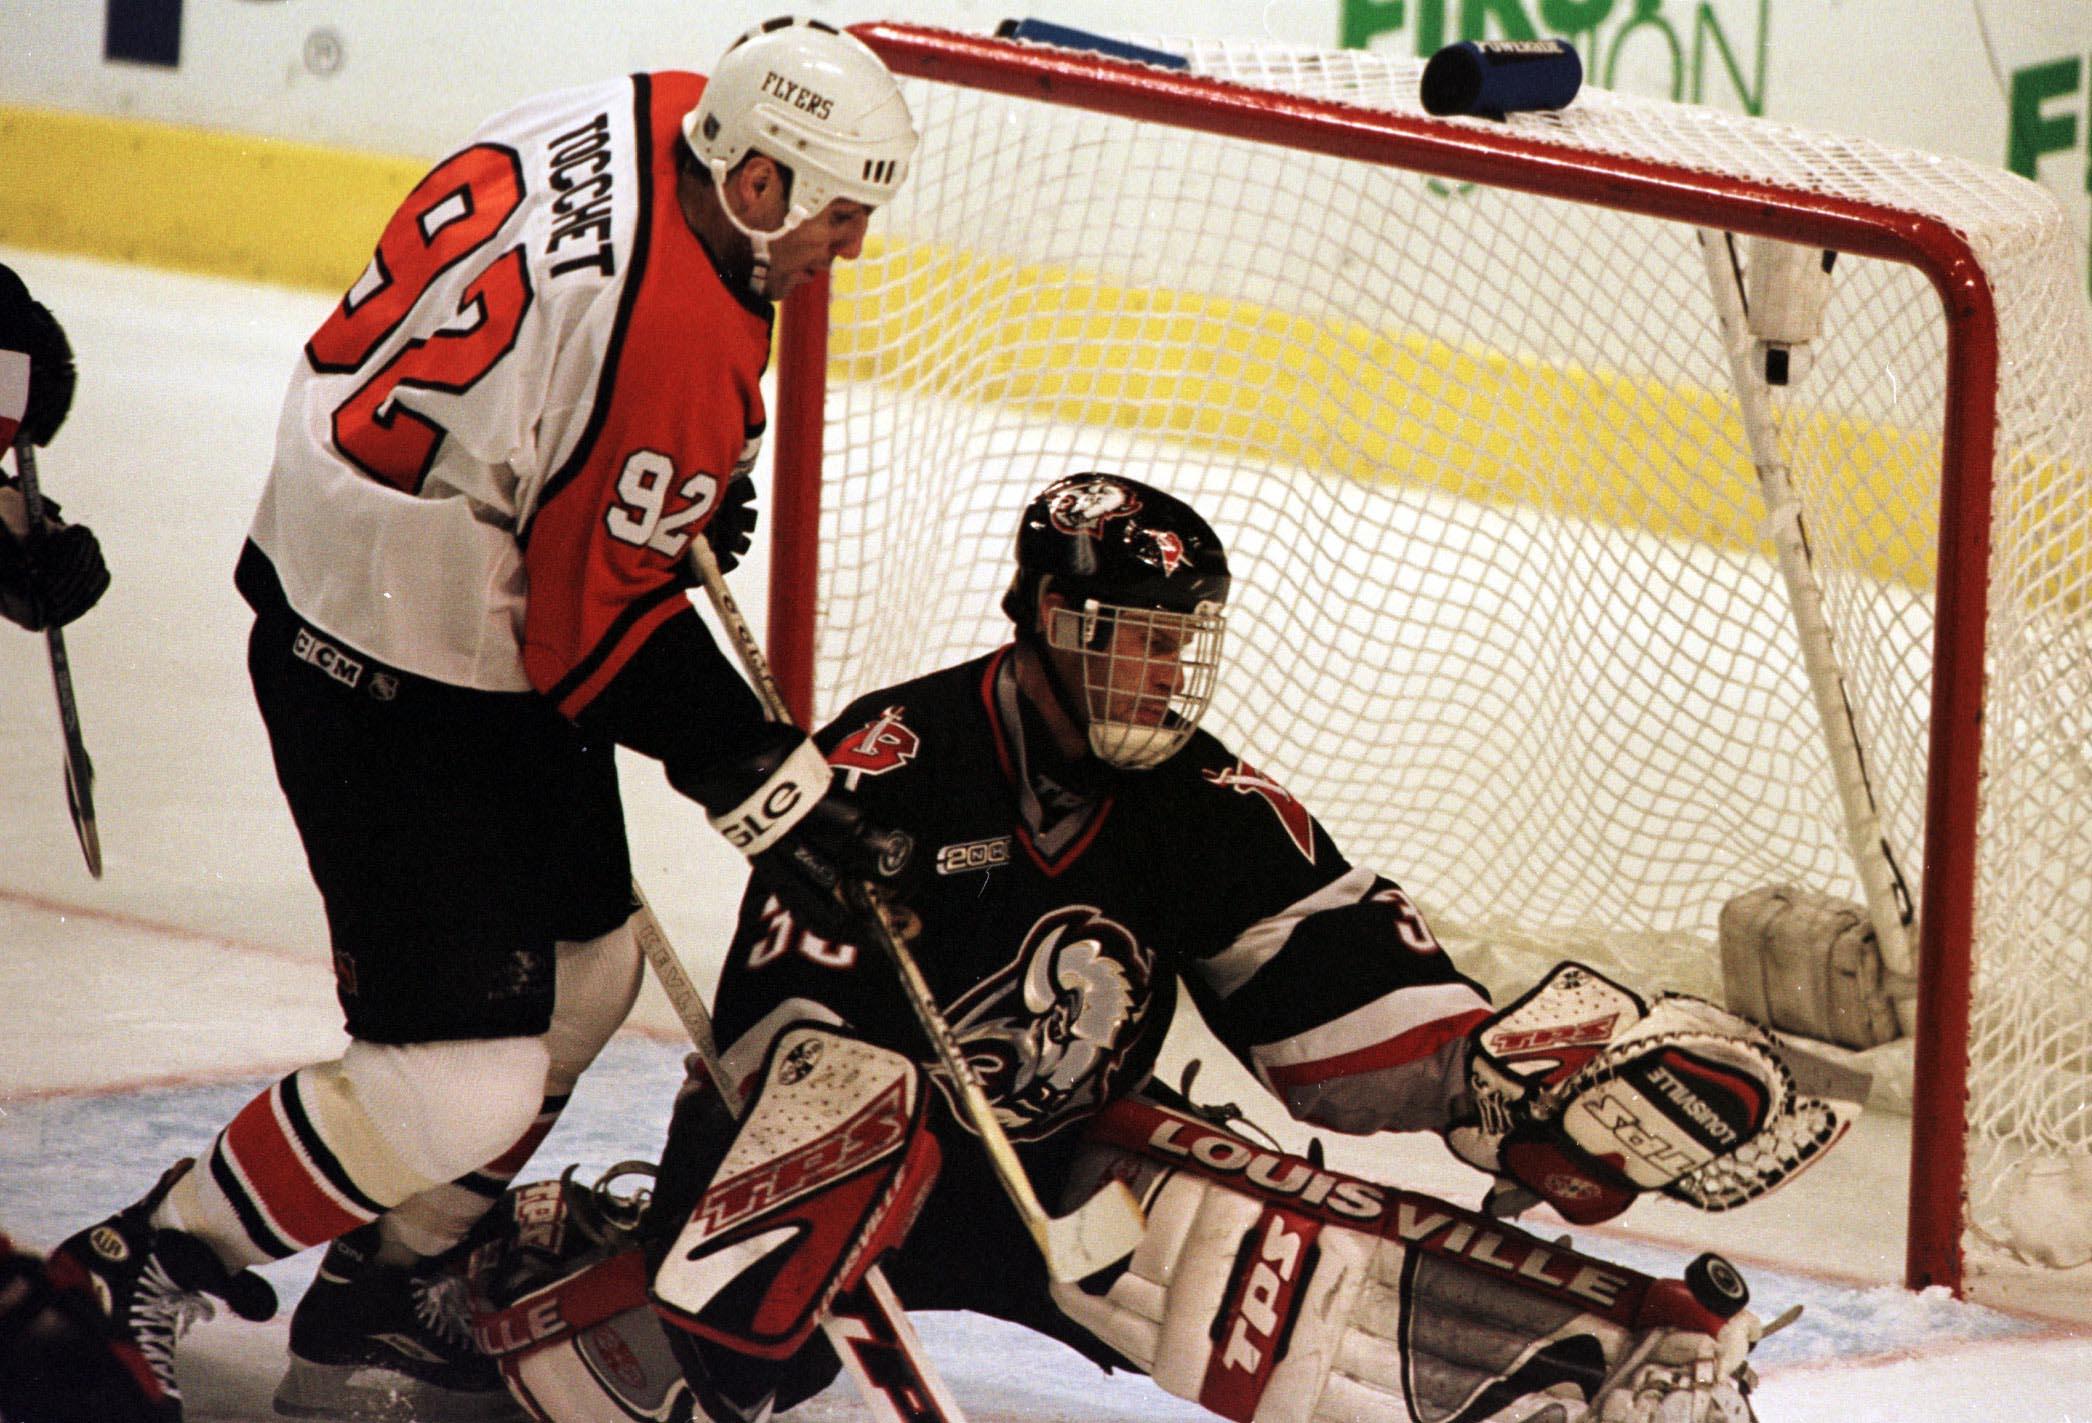 Eishockey Pin NHL DEL Torhüter Philladelphia Flyers Eishockey